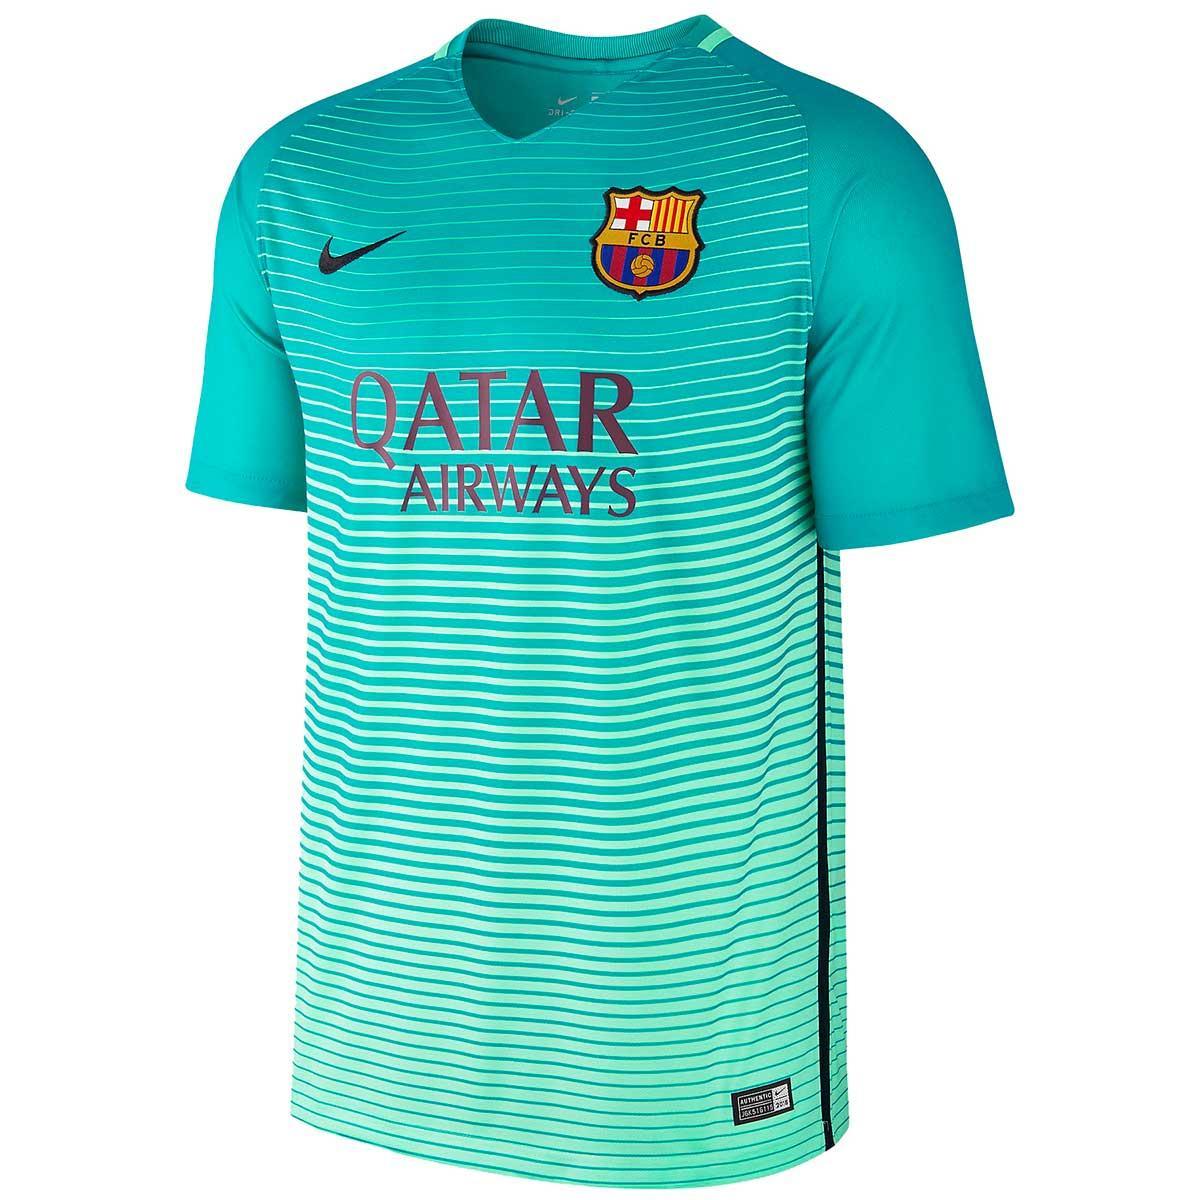 Buy Nike Fc Barcelona Jersey 2016 17 Green Online India